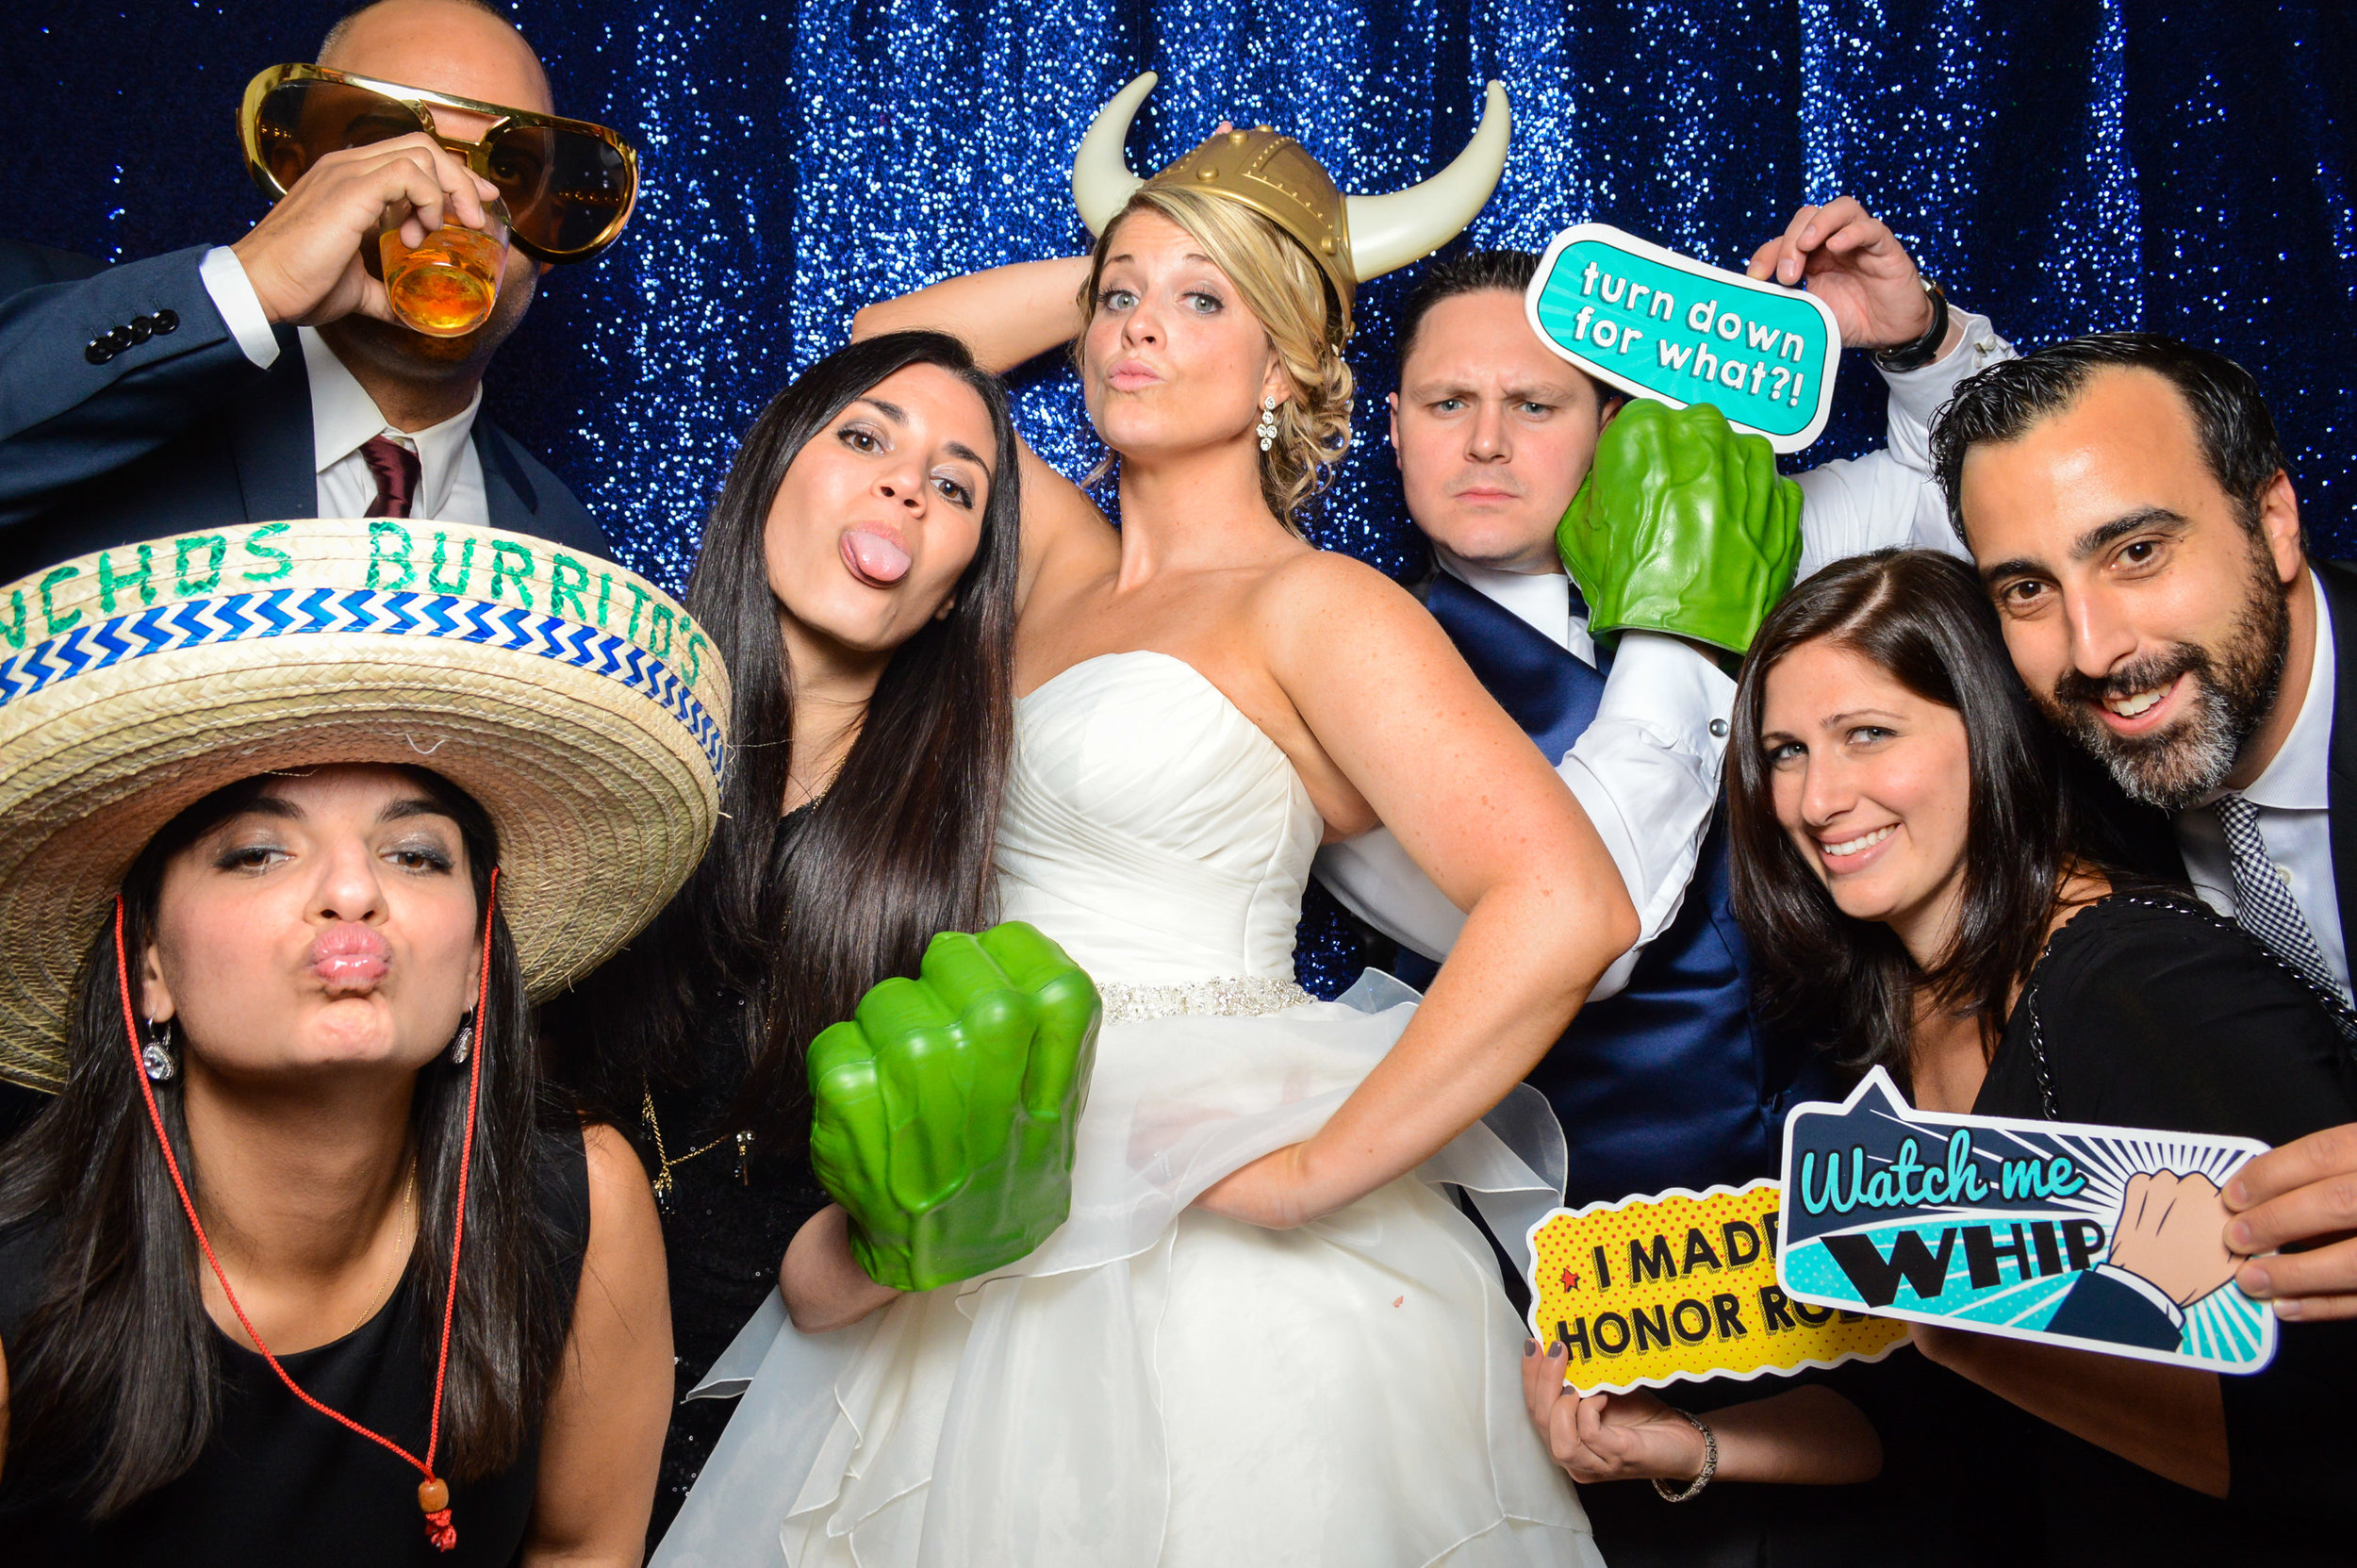 Photobooths for Weddings in NJ